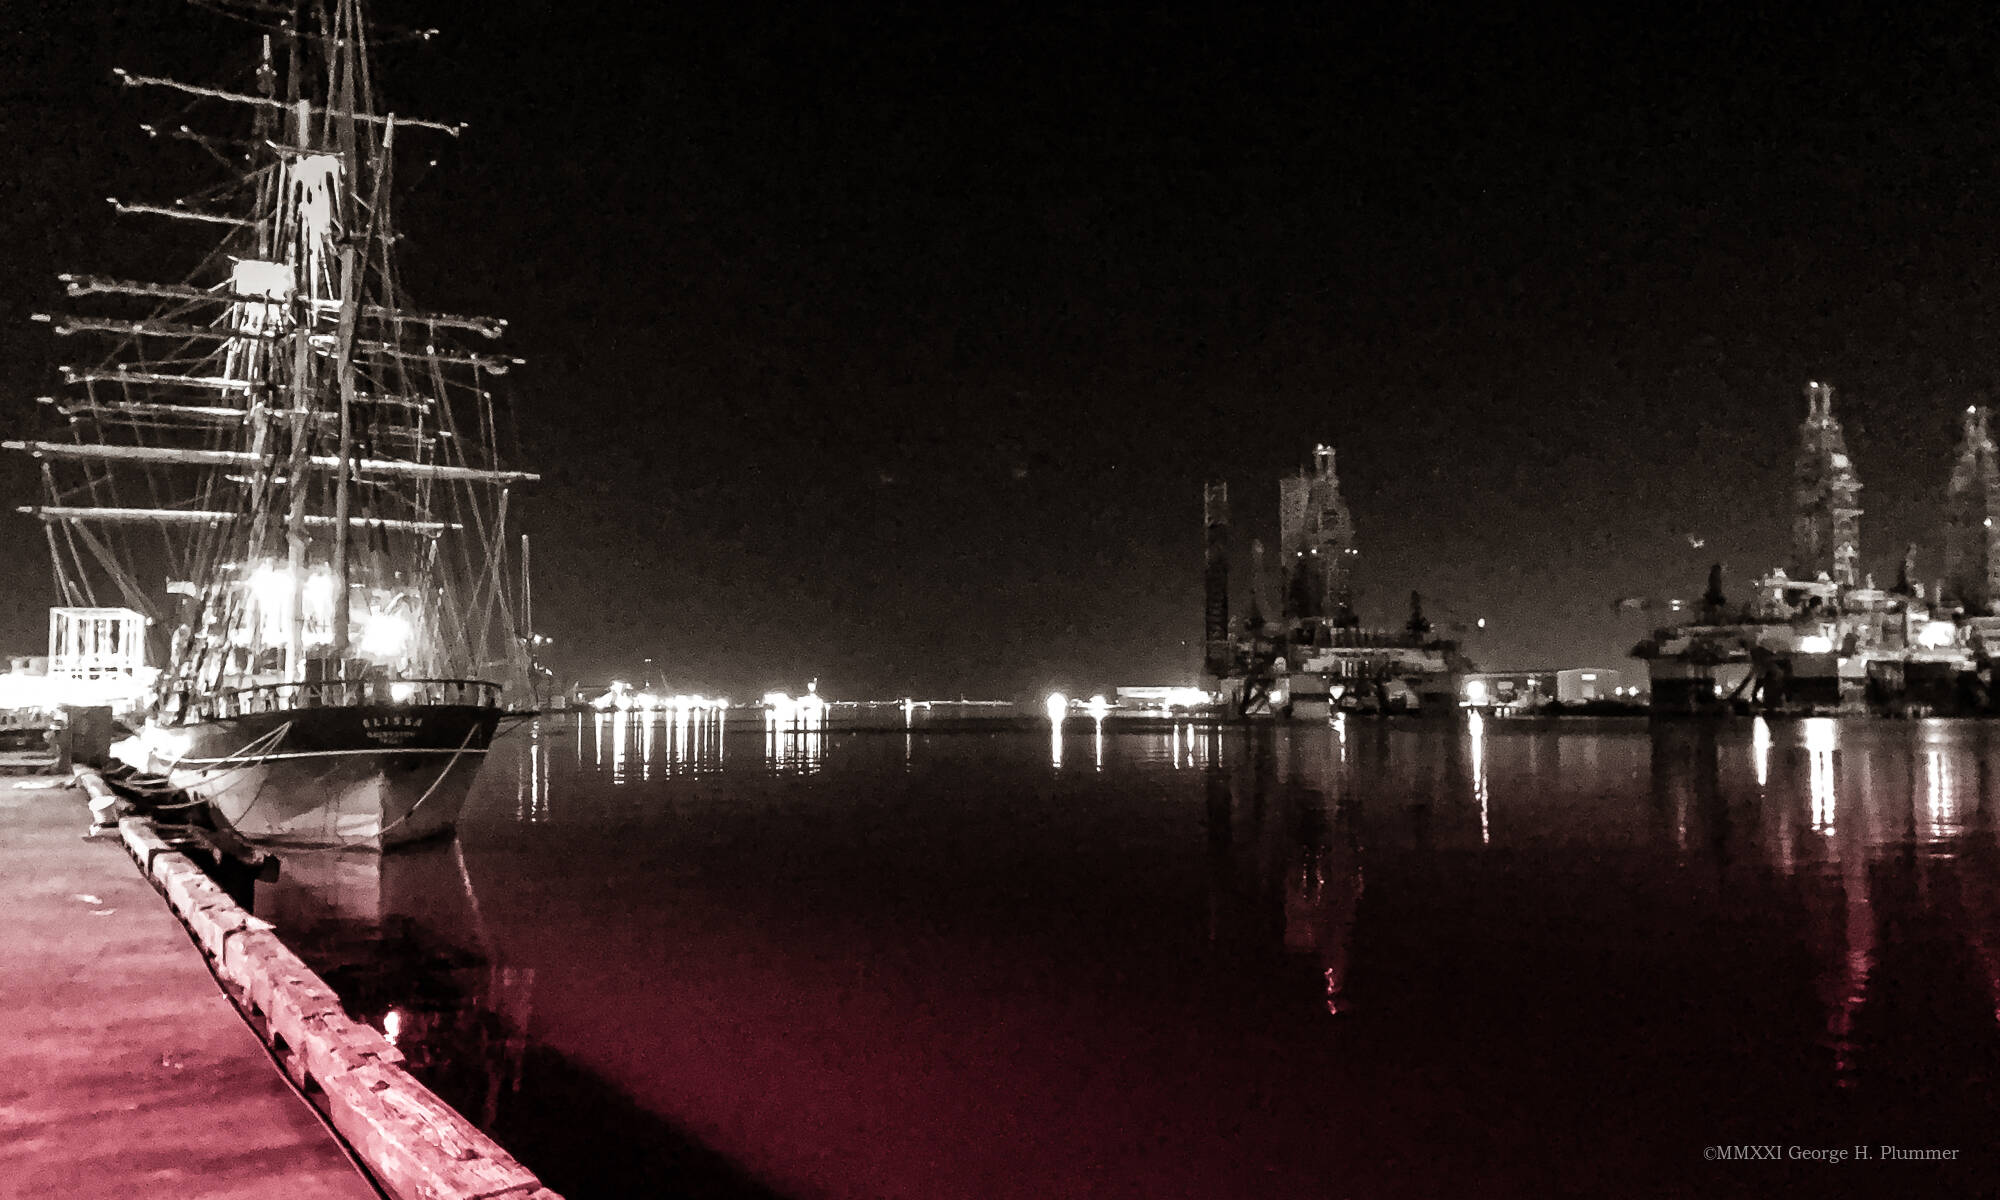 Ghost Ship?